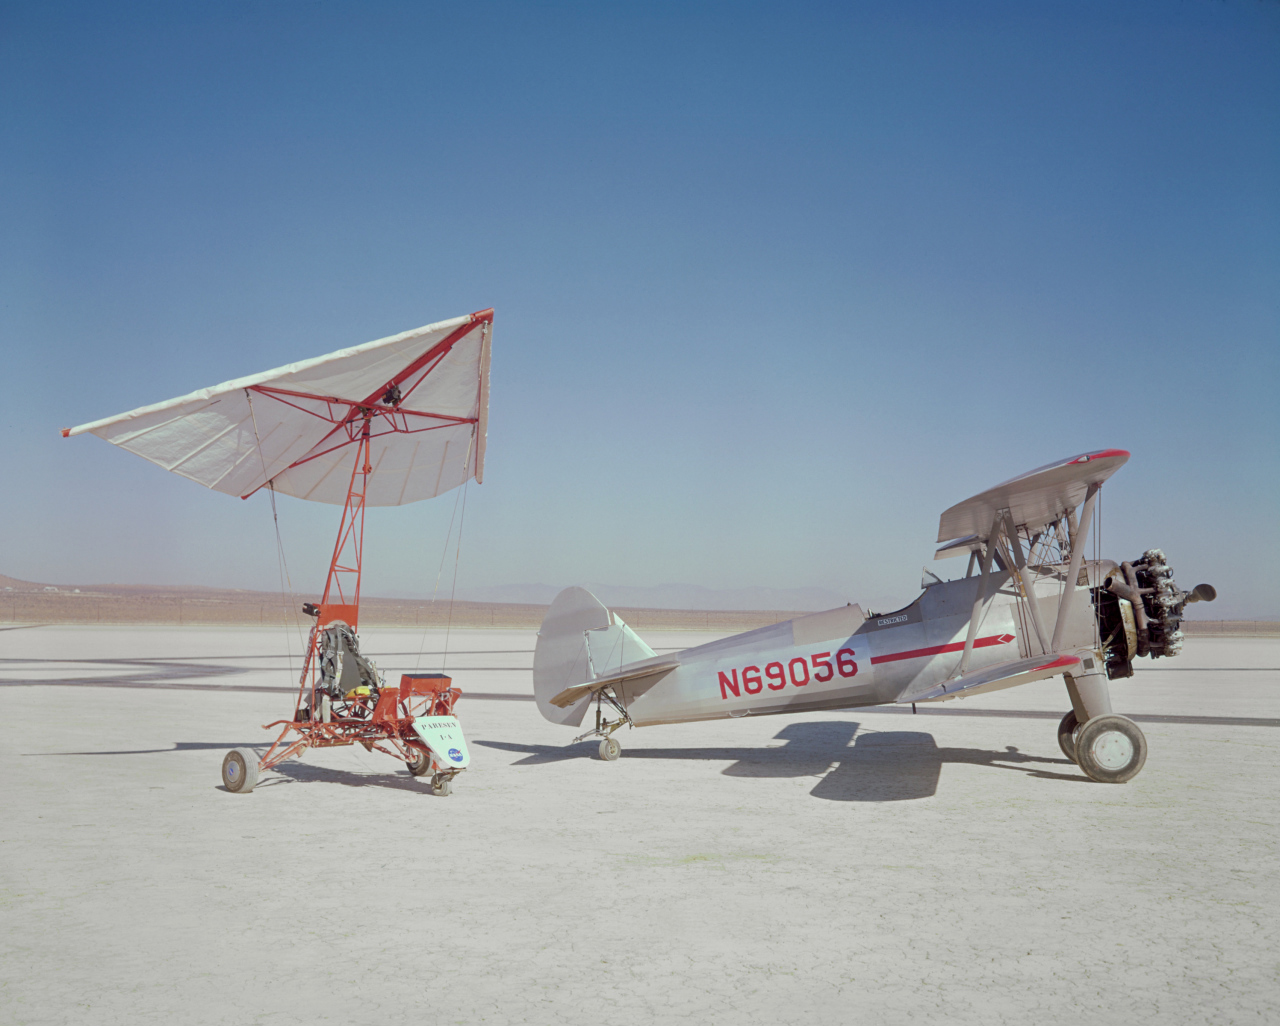 Parasev 1A and Stearman Tow Plane